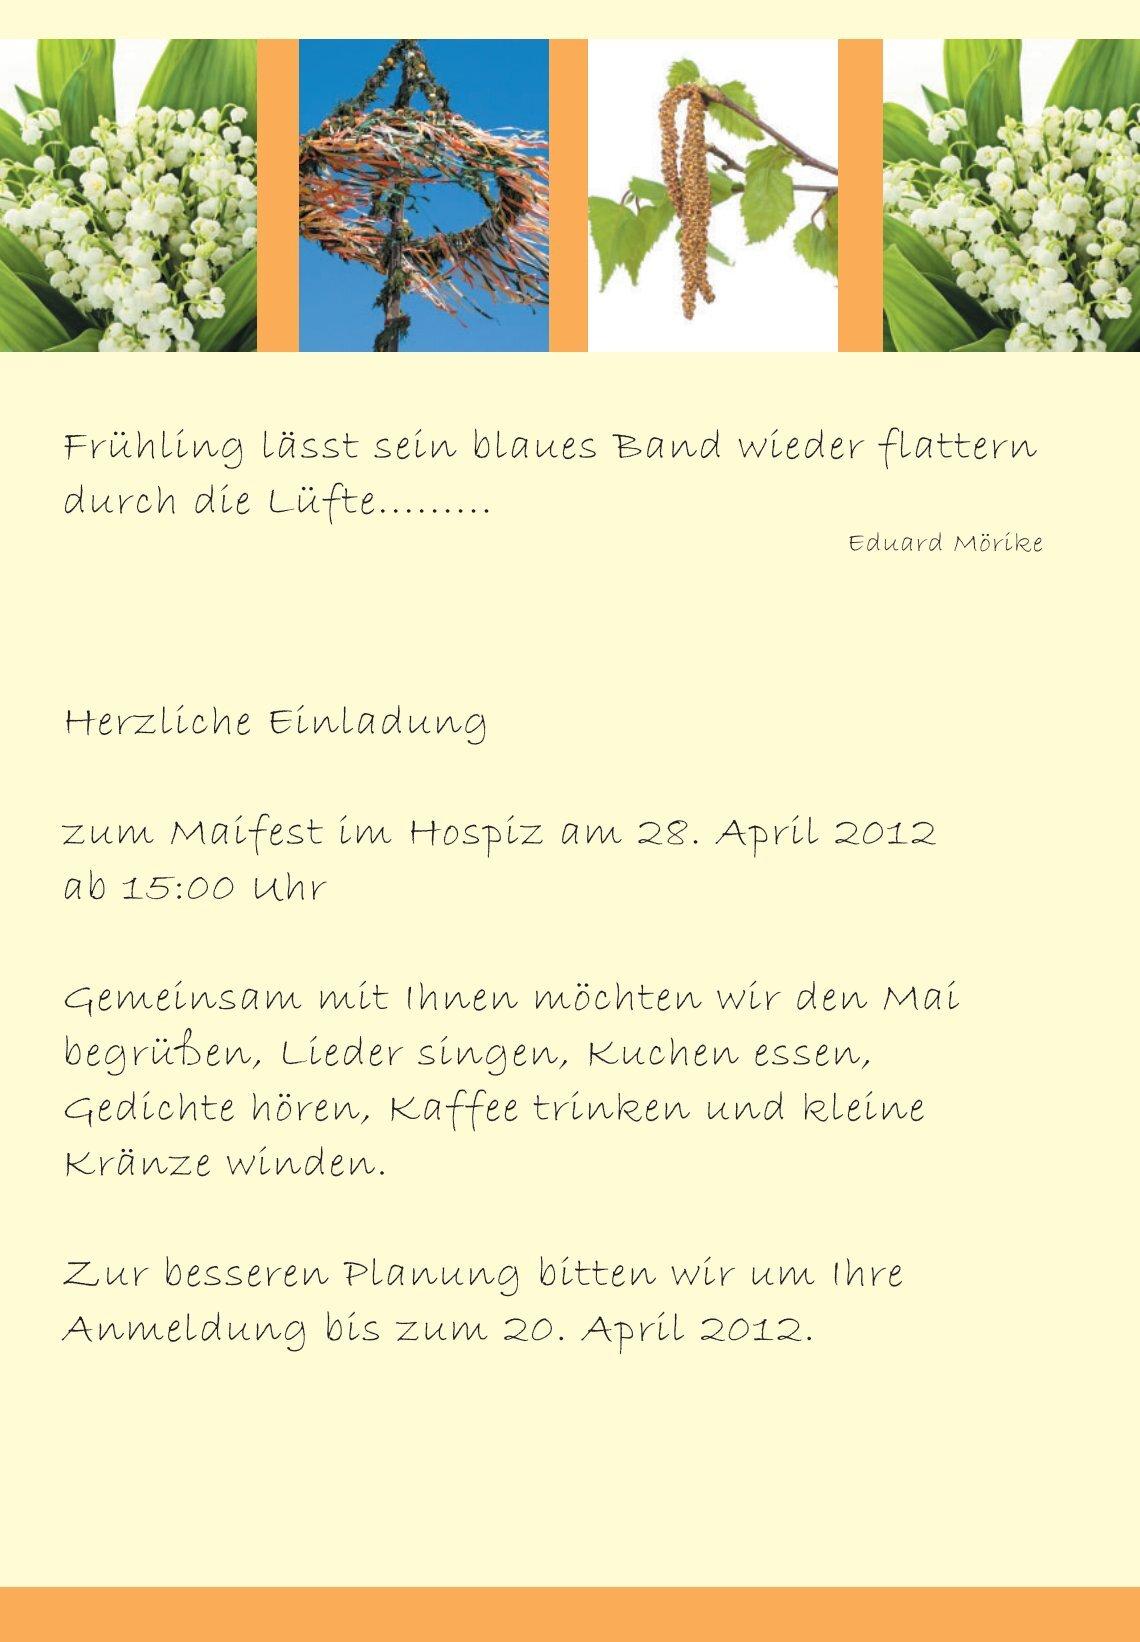 5 Free Magazines From Foerdervereinhospizrheinbergde